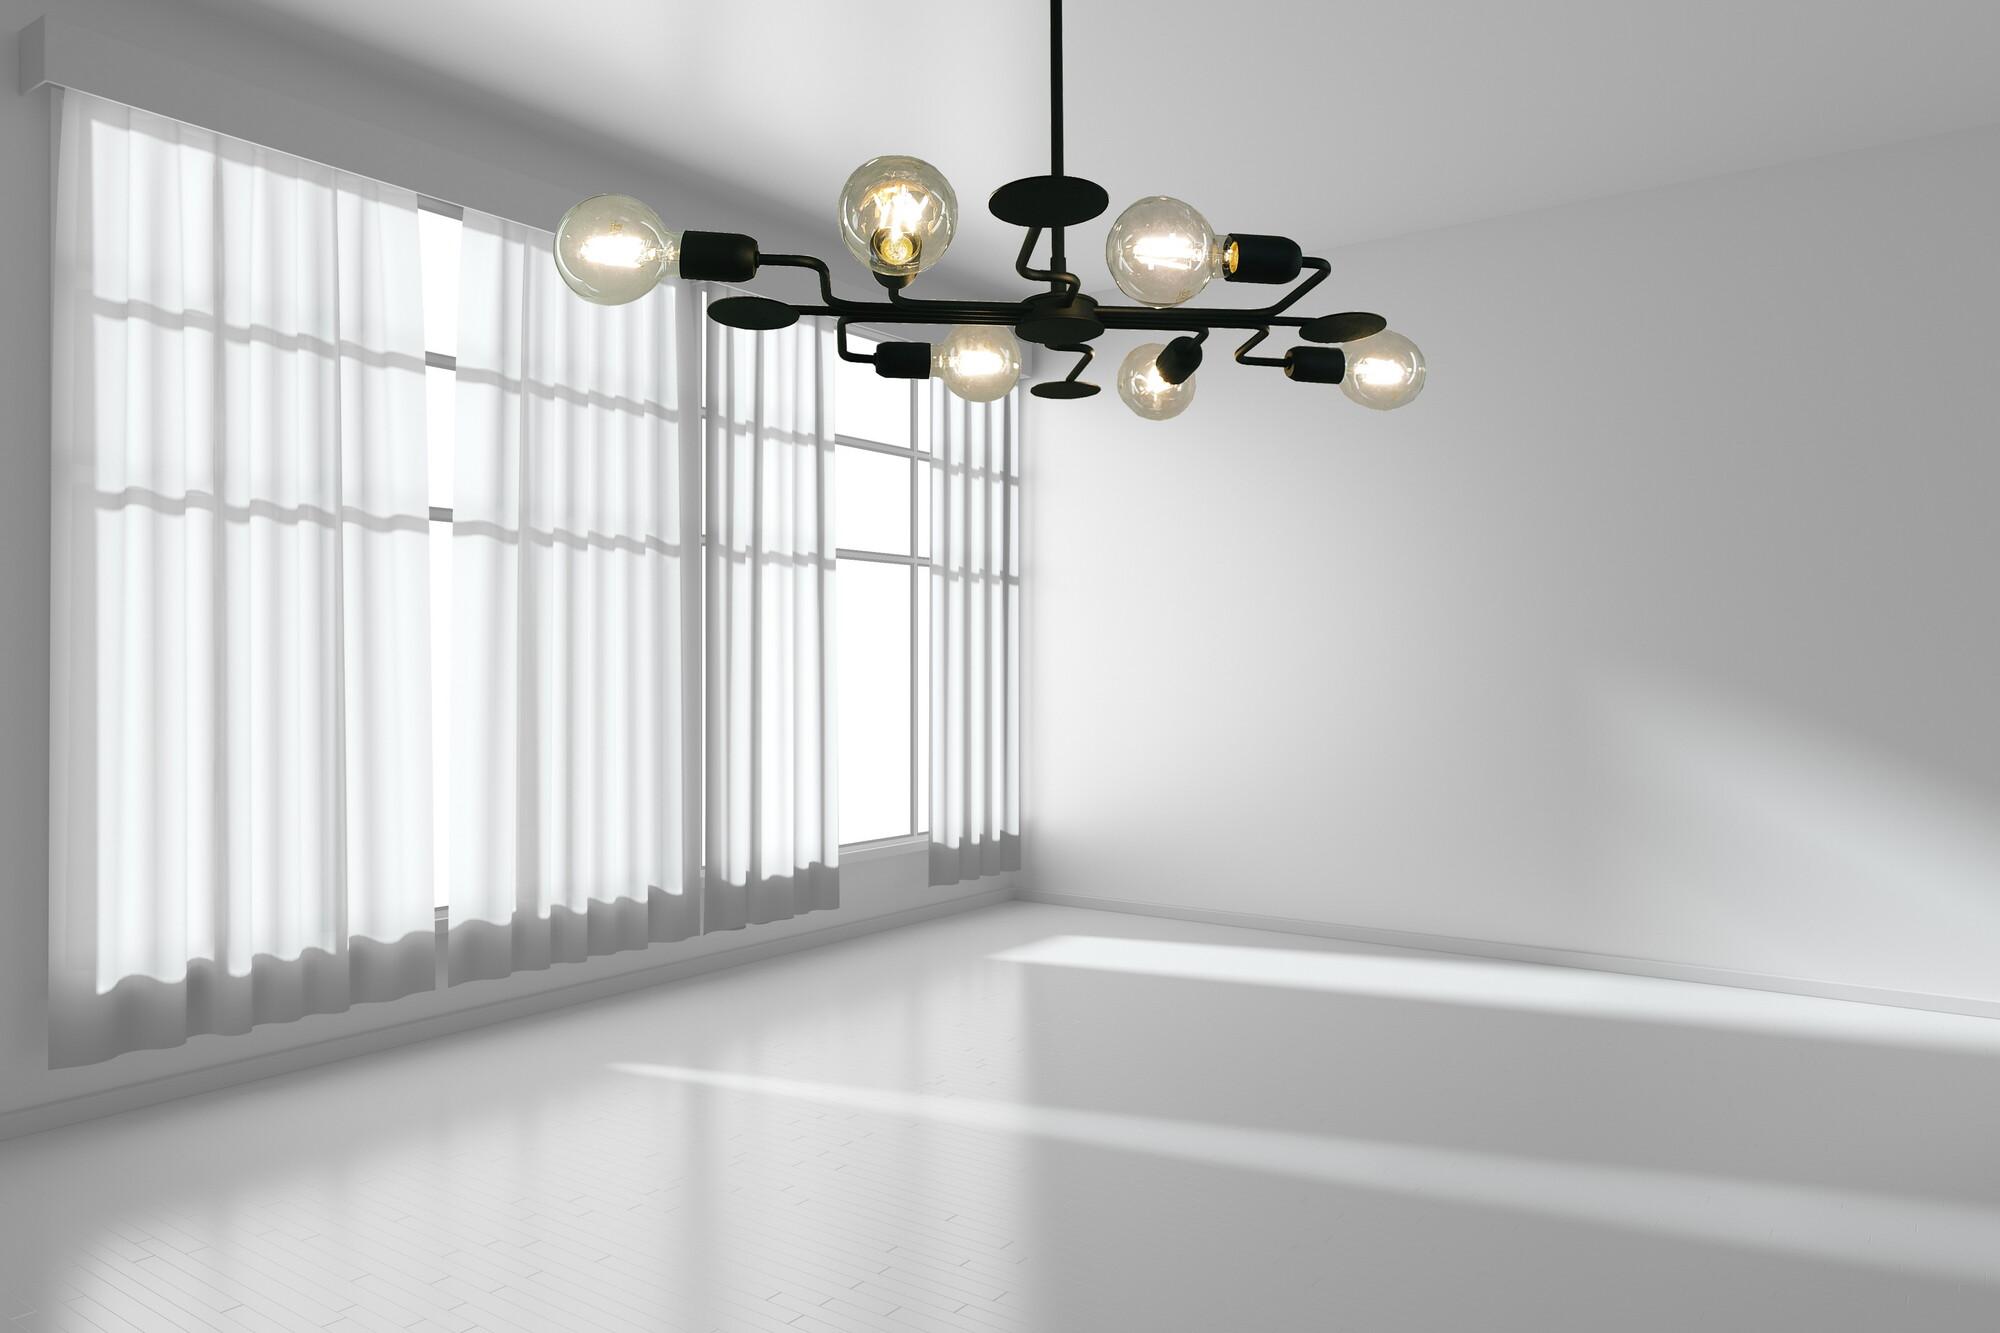 CIRCUIT Hanglamp E27 6x Zwart